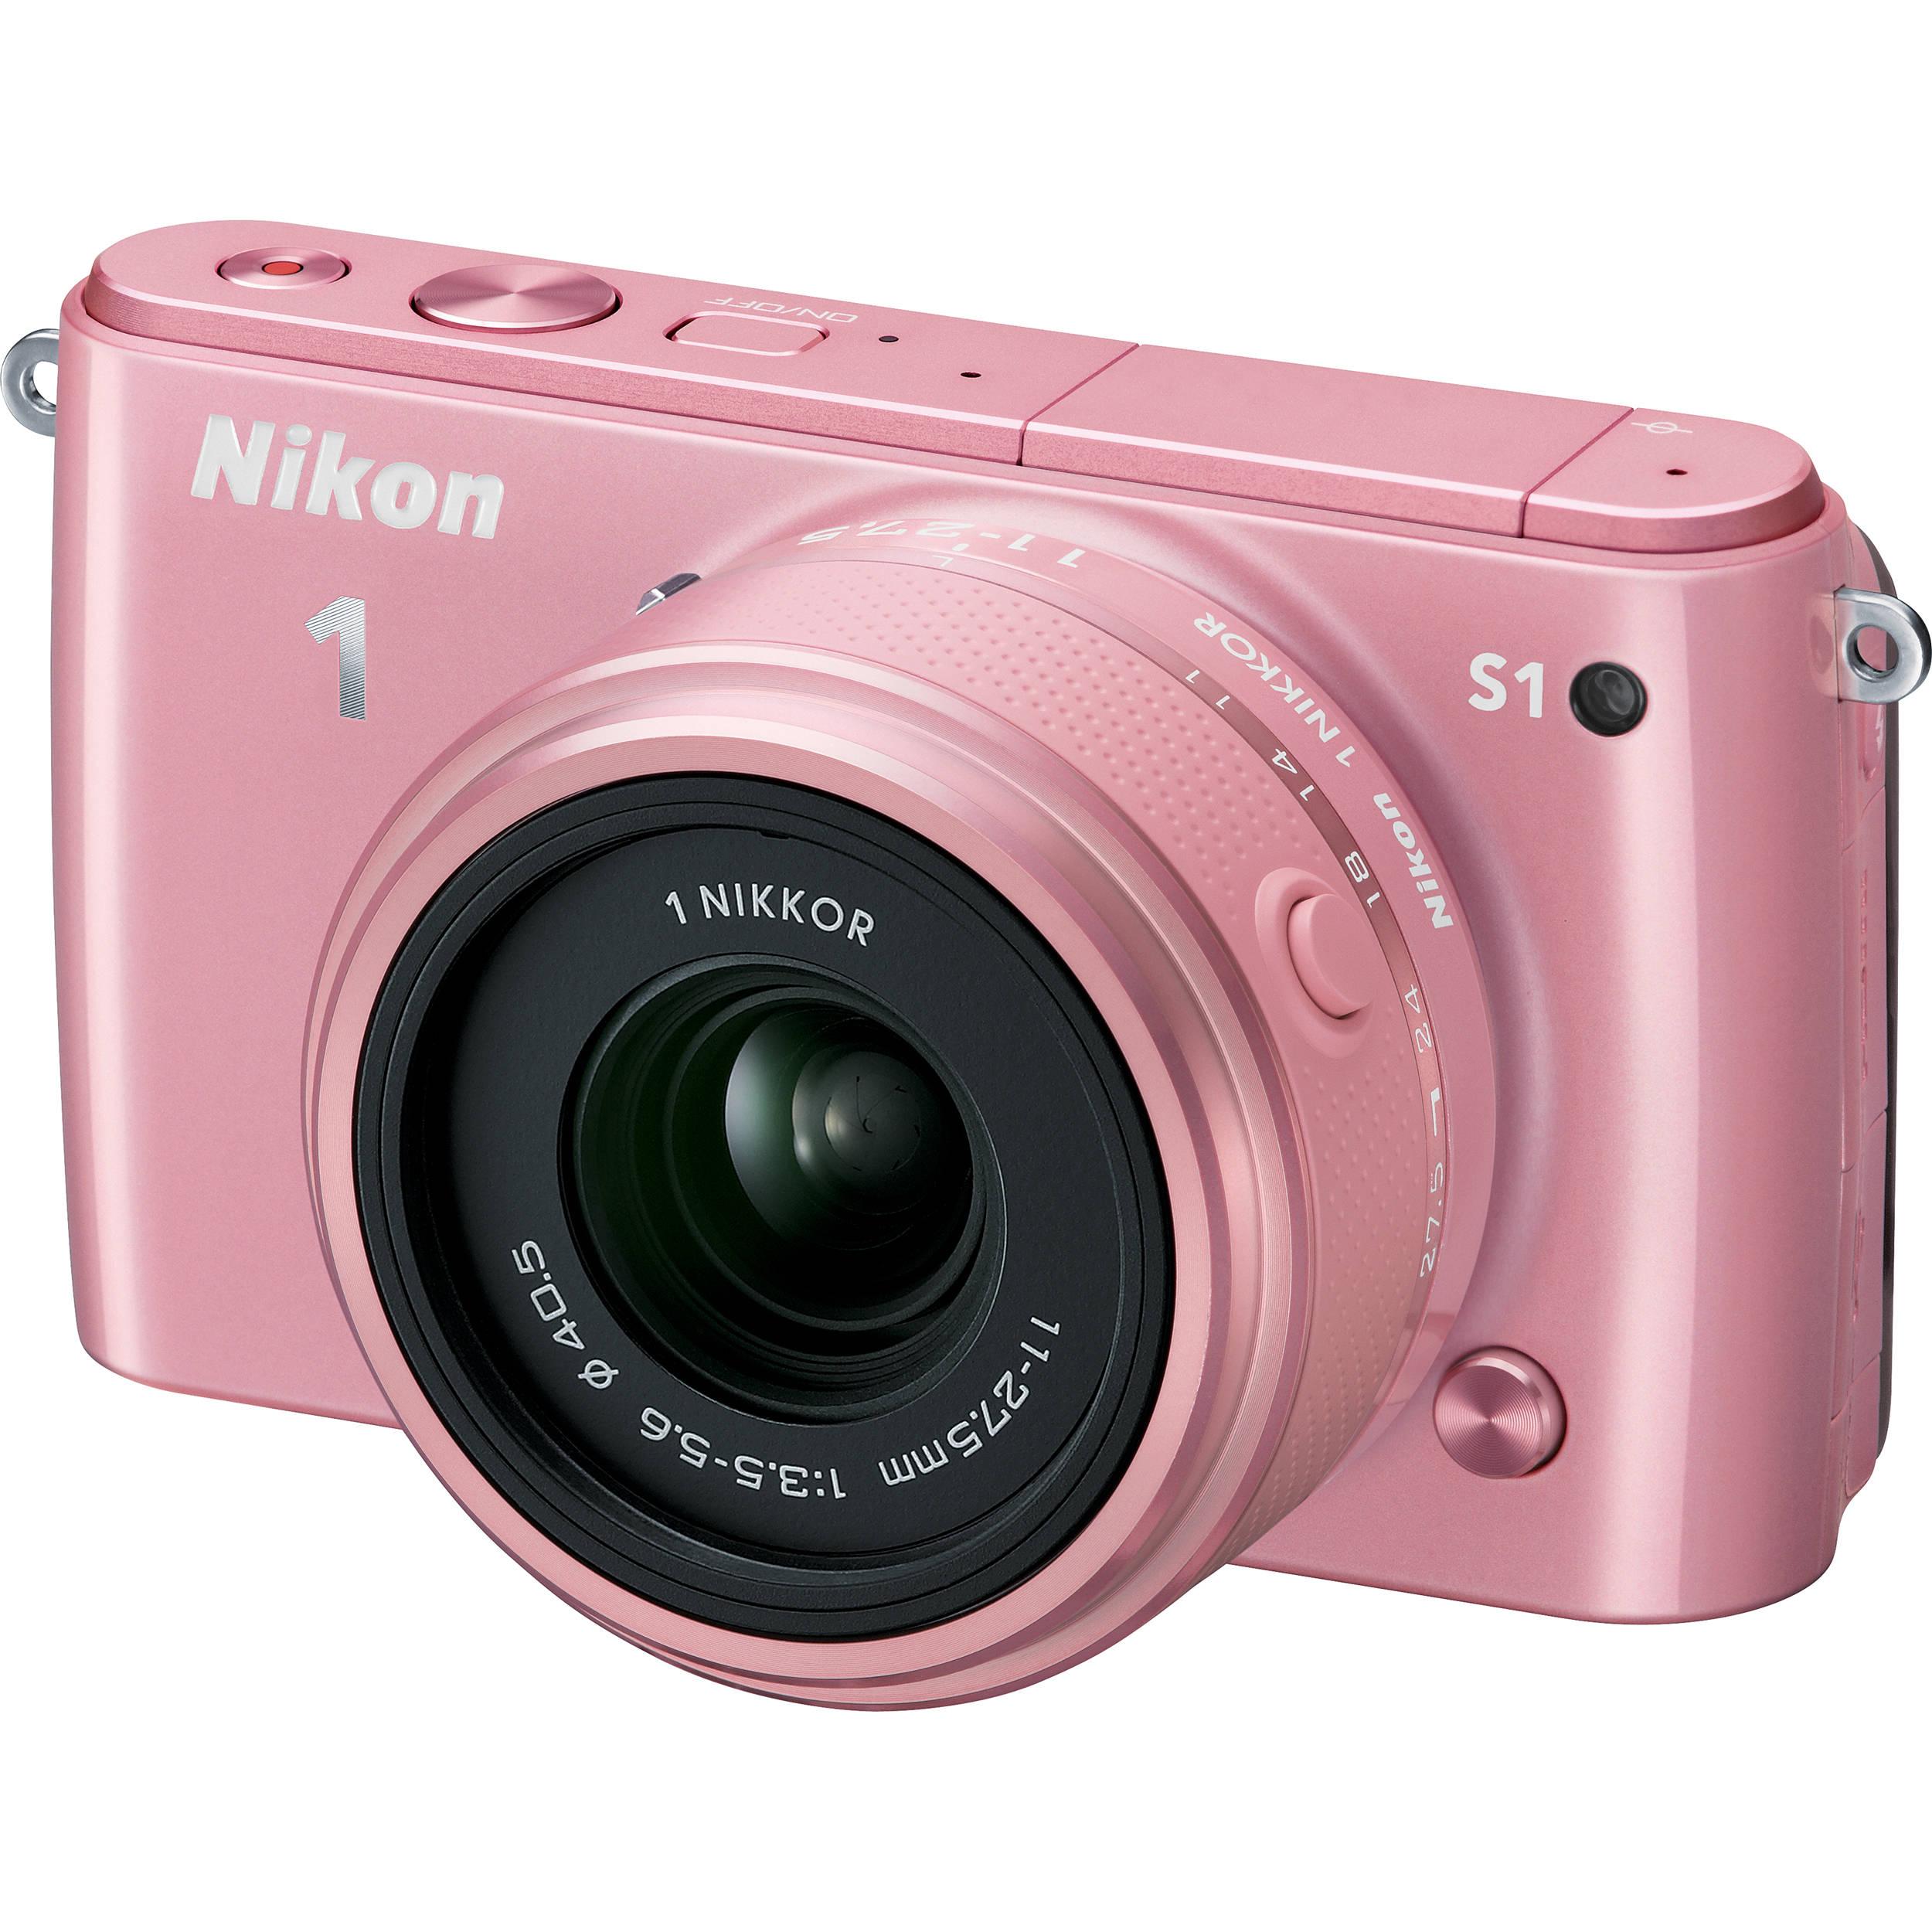 Nikon 1 S1 Mirrorless Digital Camera with 11-27.5mm Lens 27620